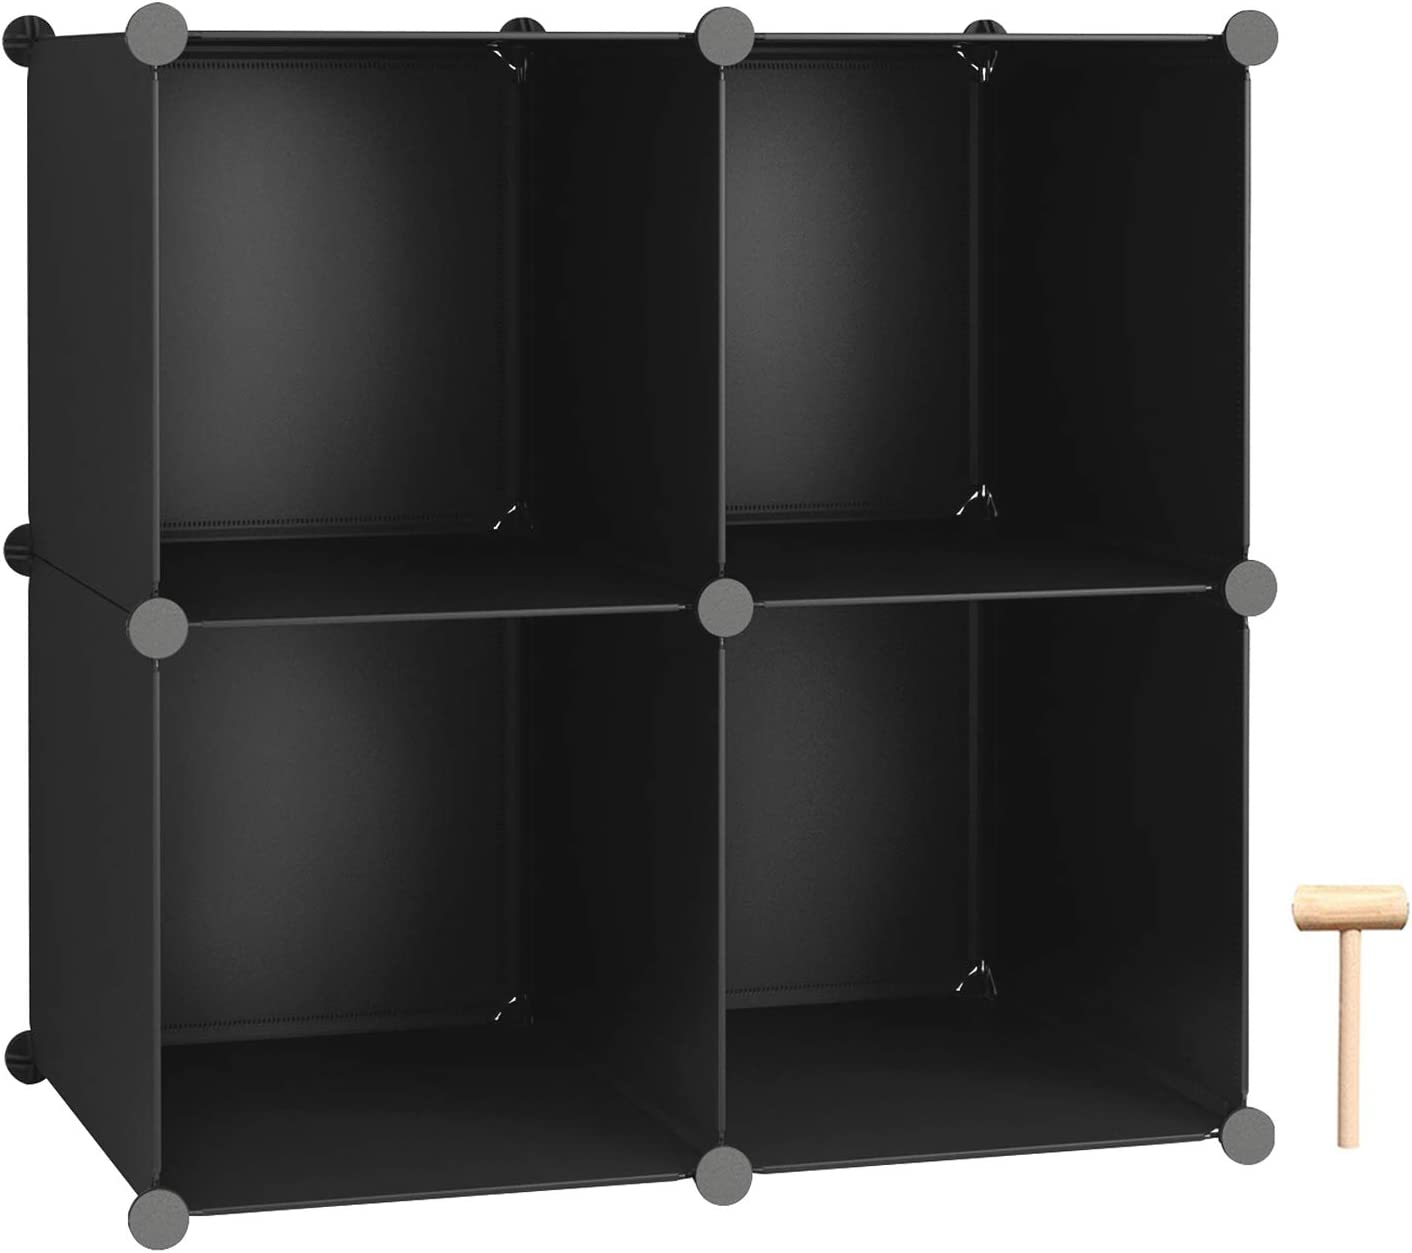 "C&AHOME Cube Storage, 4-Cube Organizer Units, Plastic Closet Storage Shelves, DIY Book Shelf, Modular Bookcase, Cabinet Ideal for Bedroom, Living Room, Home Office, 24.8"" L x 12.4"" W x 24.8"" H Black"